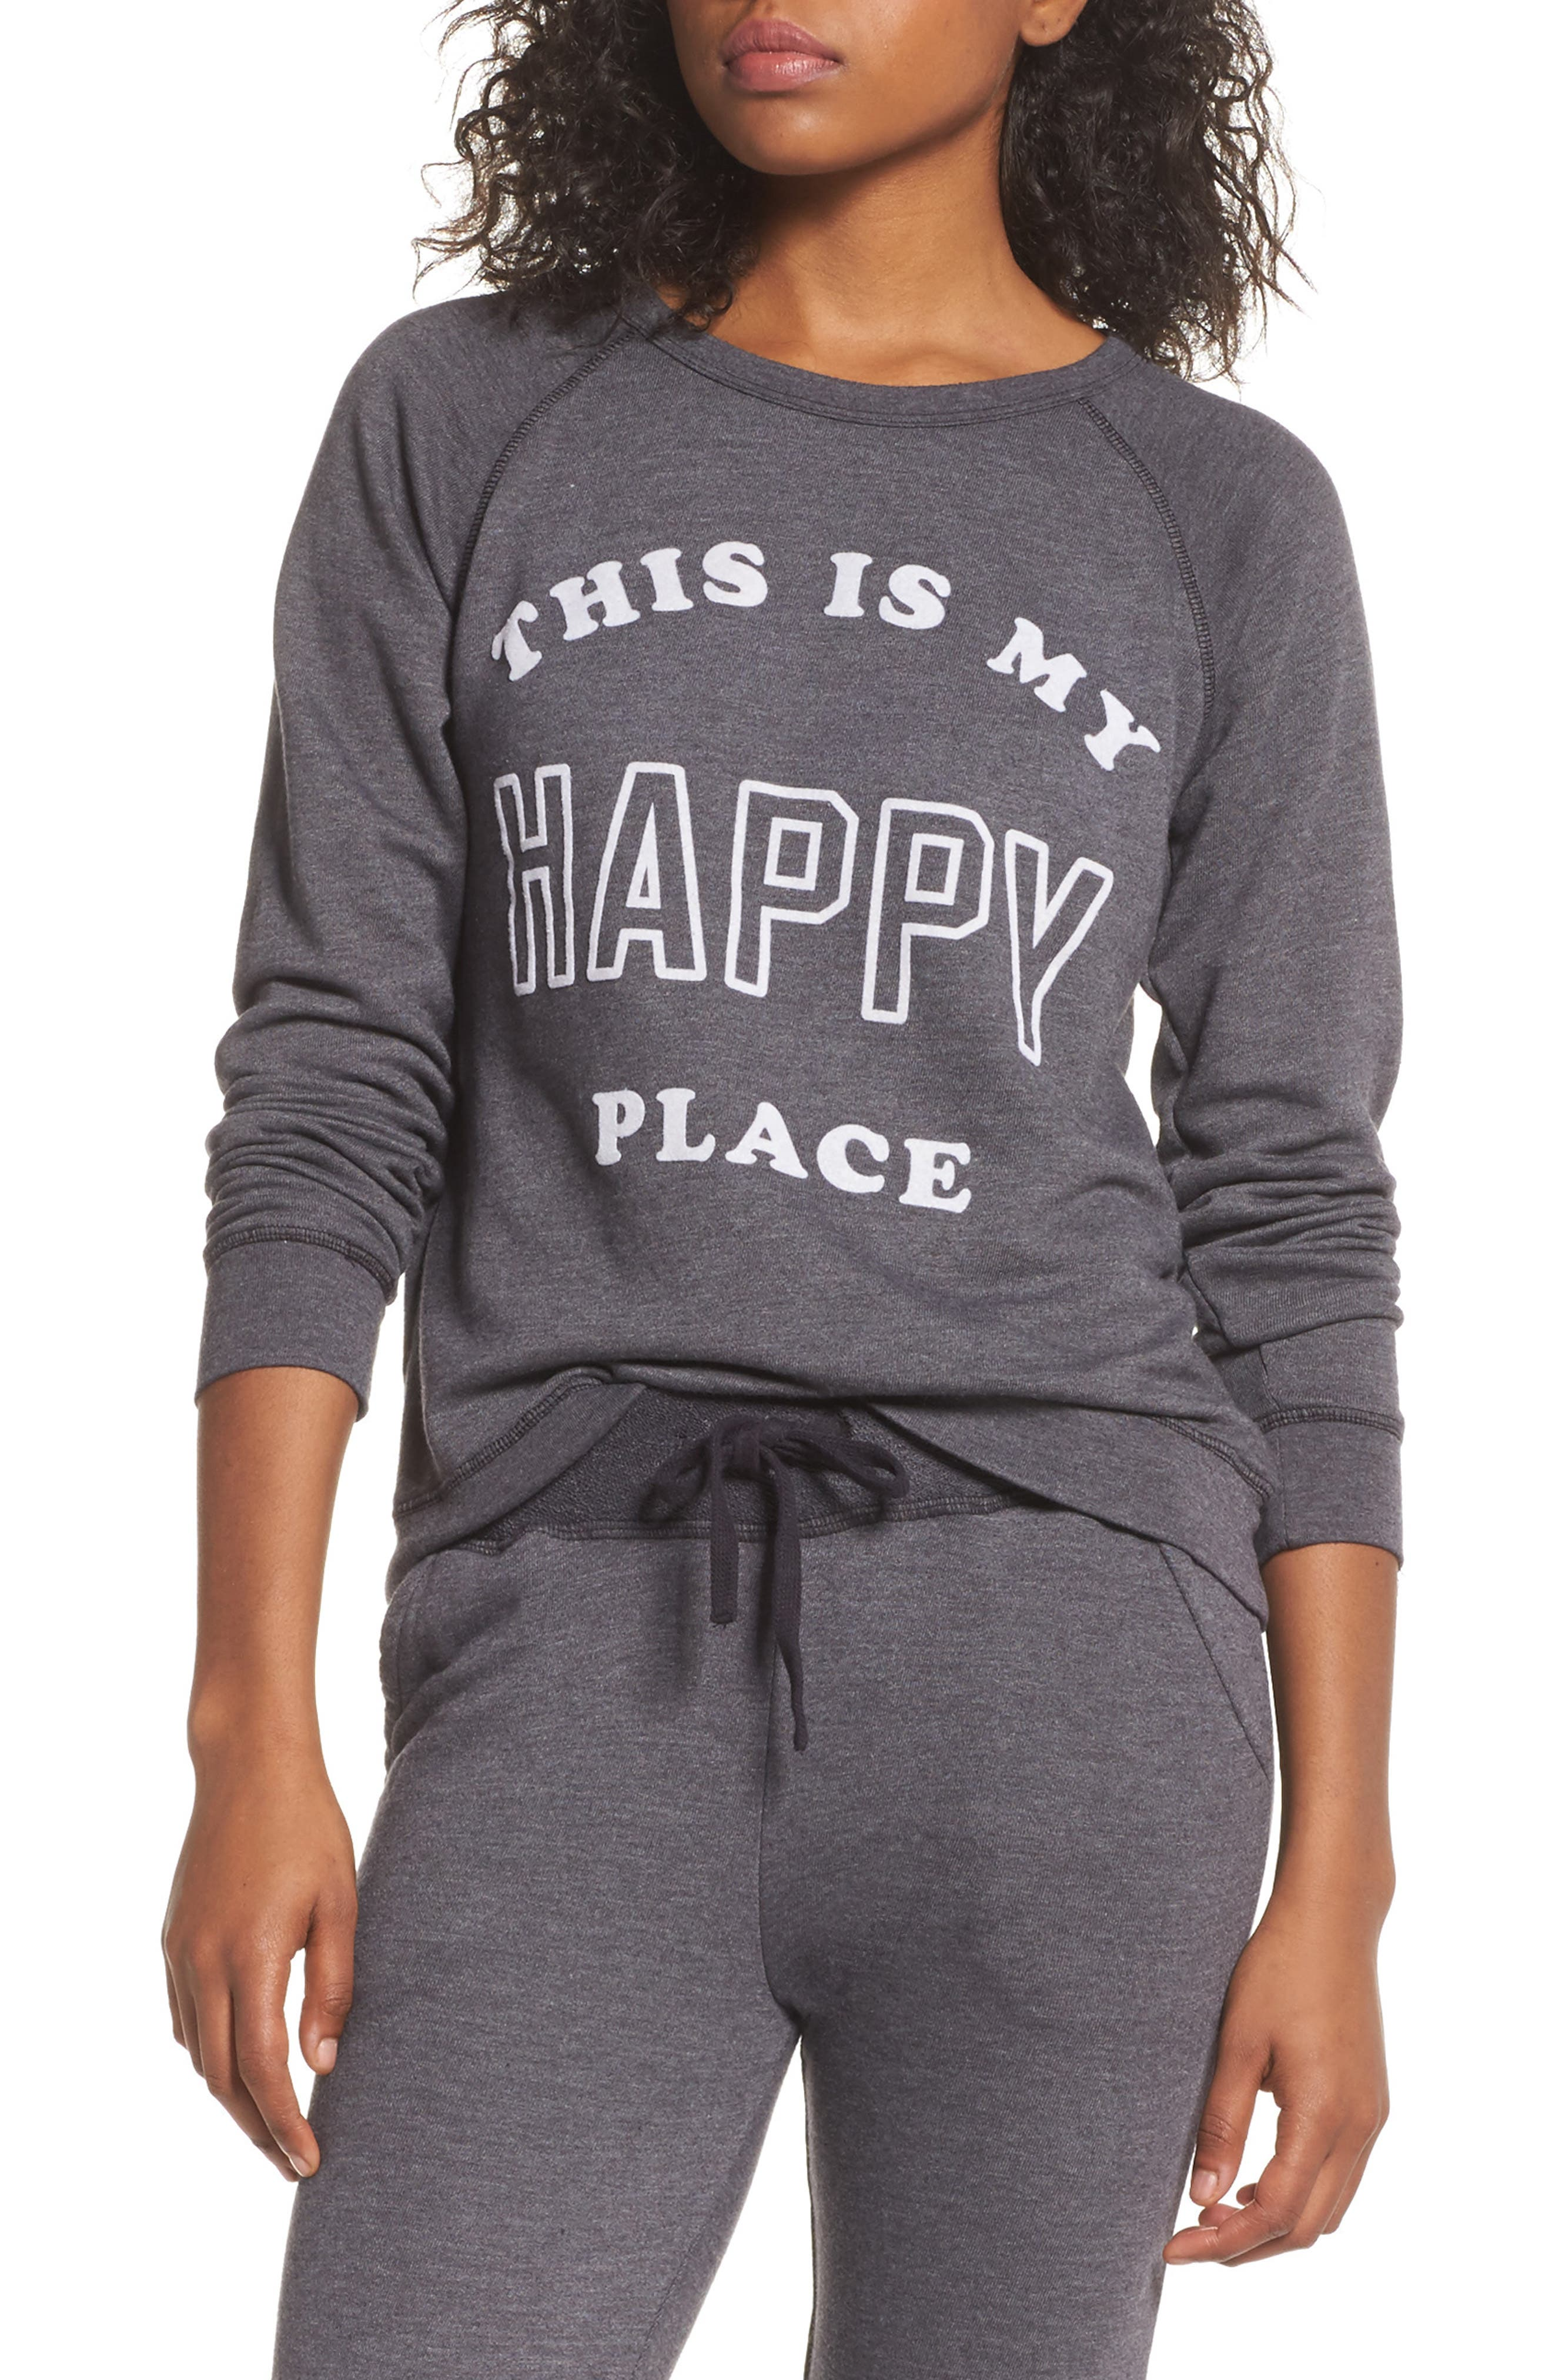 Main Image - Junk Food Happy Place Sweatshirt